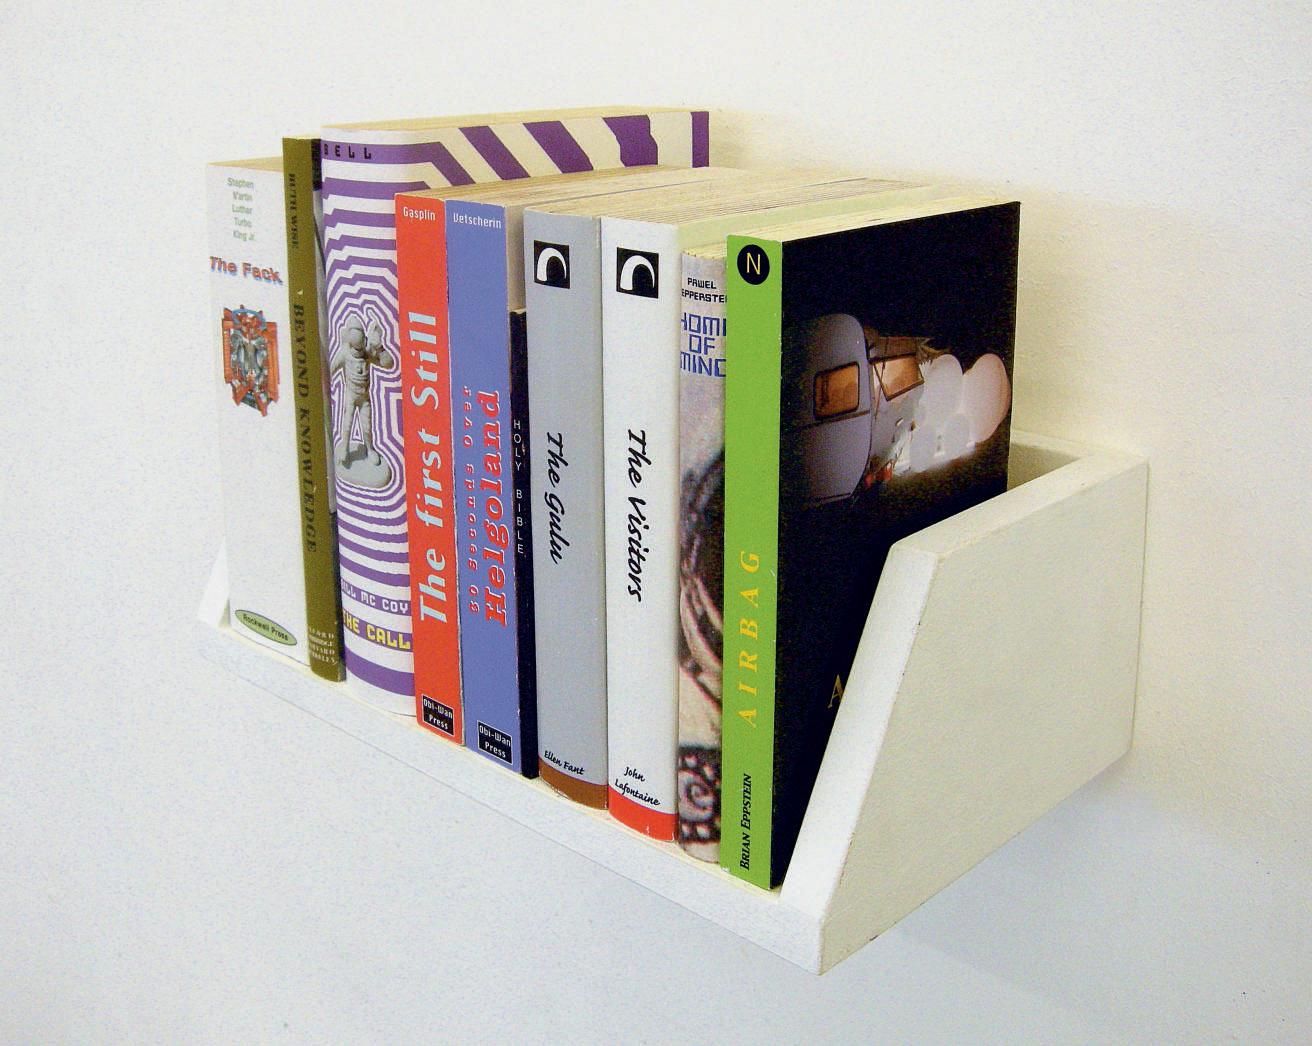 Science Fiction Bibliothek, 2000-10